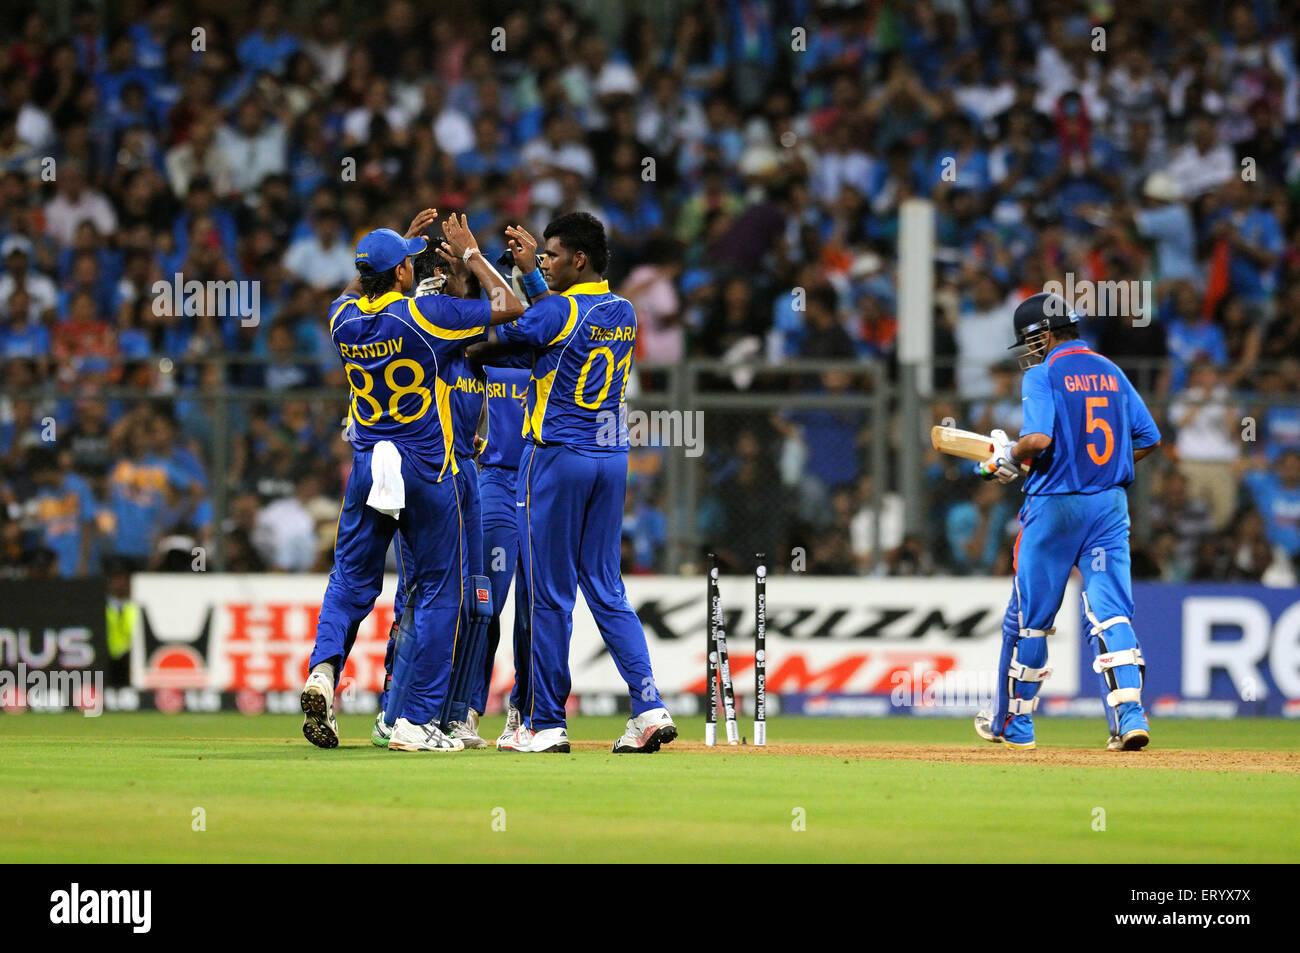 Sri Lankan team members celebrate wicket batsman Gautam Gambhir 2011 ICC World Cup Final Wankhede Stadium Mumbai - Stock Image